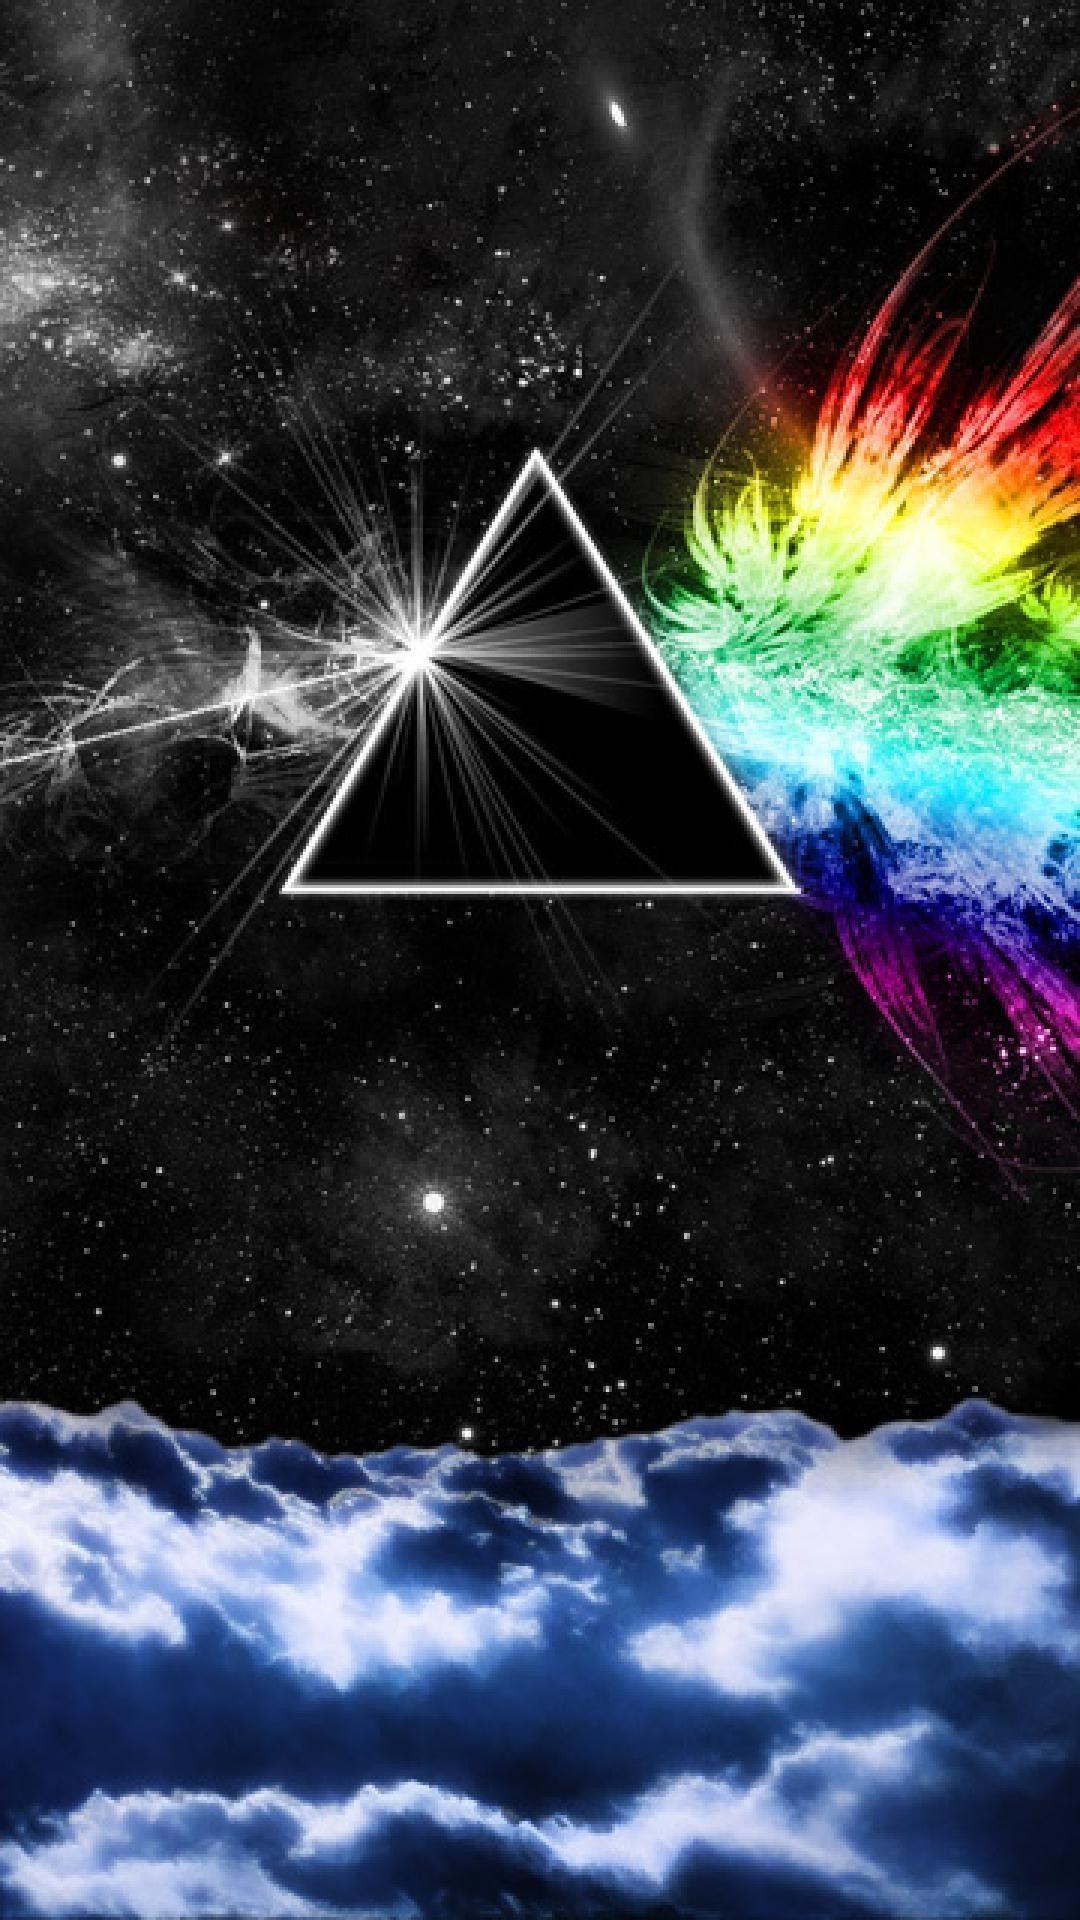 33 Pink Floyd 2019 Wallpapers On Wallpapersafari